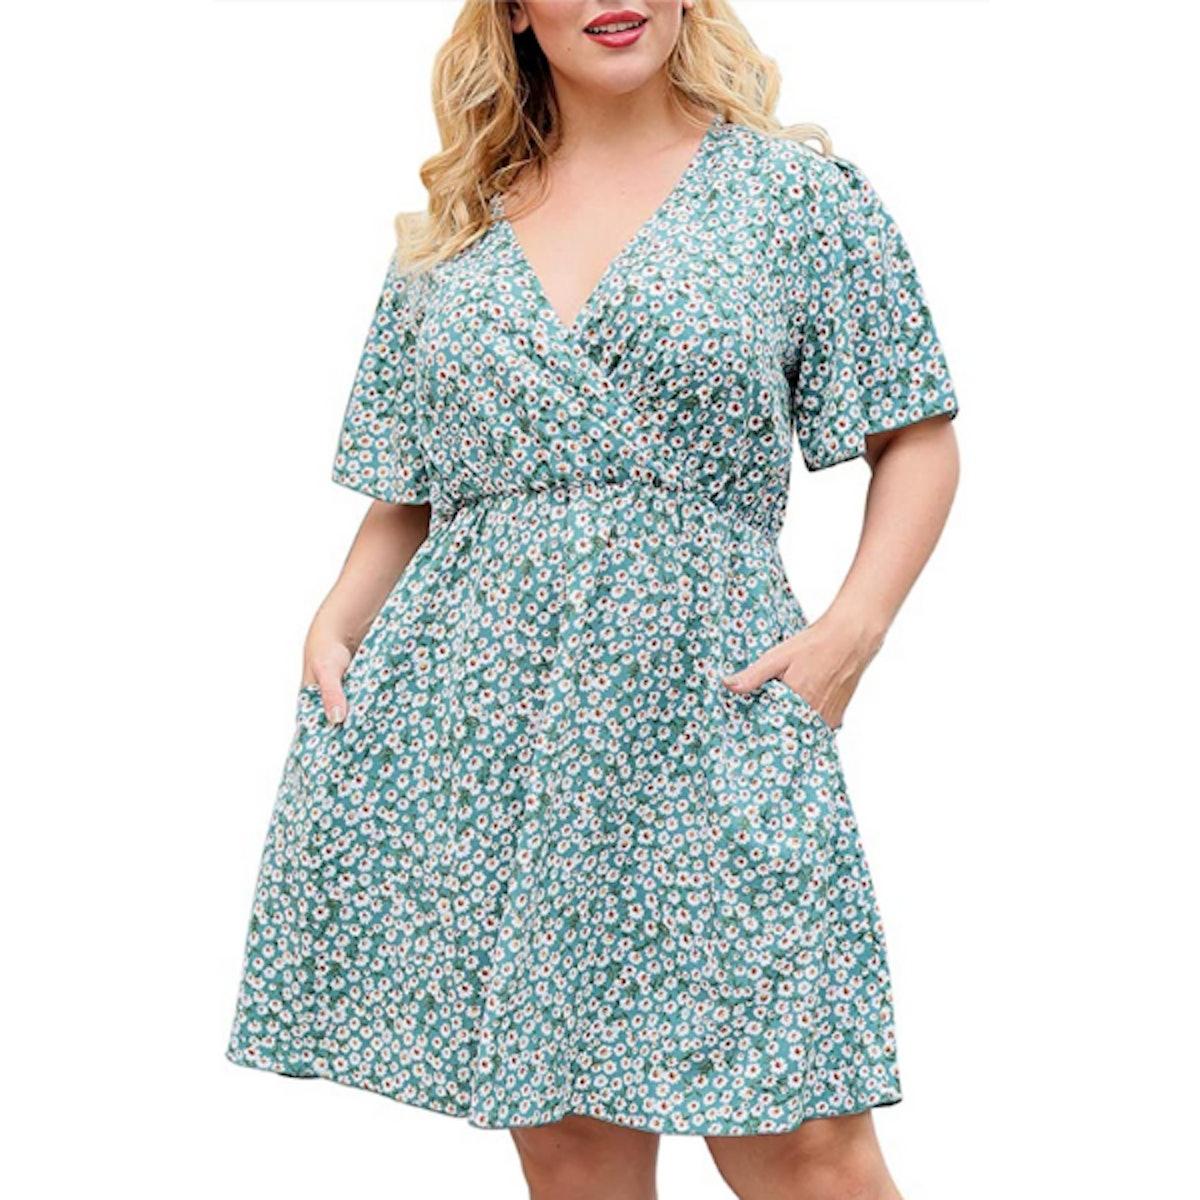 Nemidor Plus Size Wrap Dress with Pockets